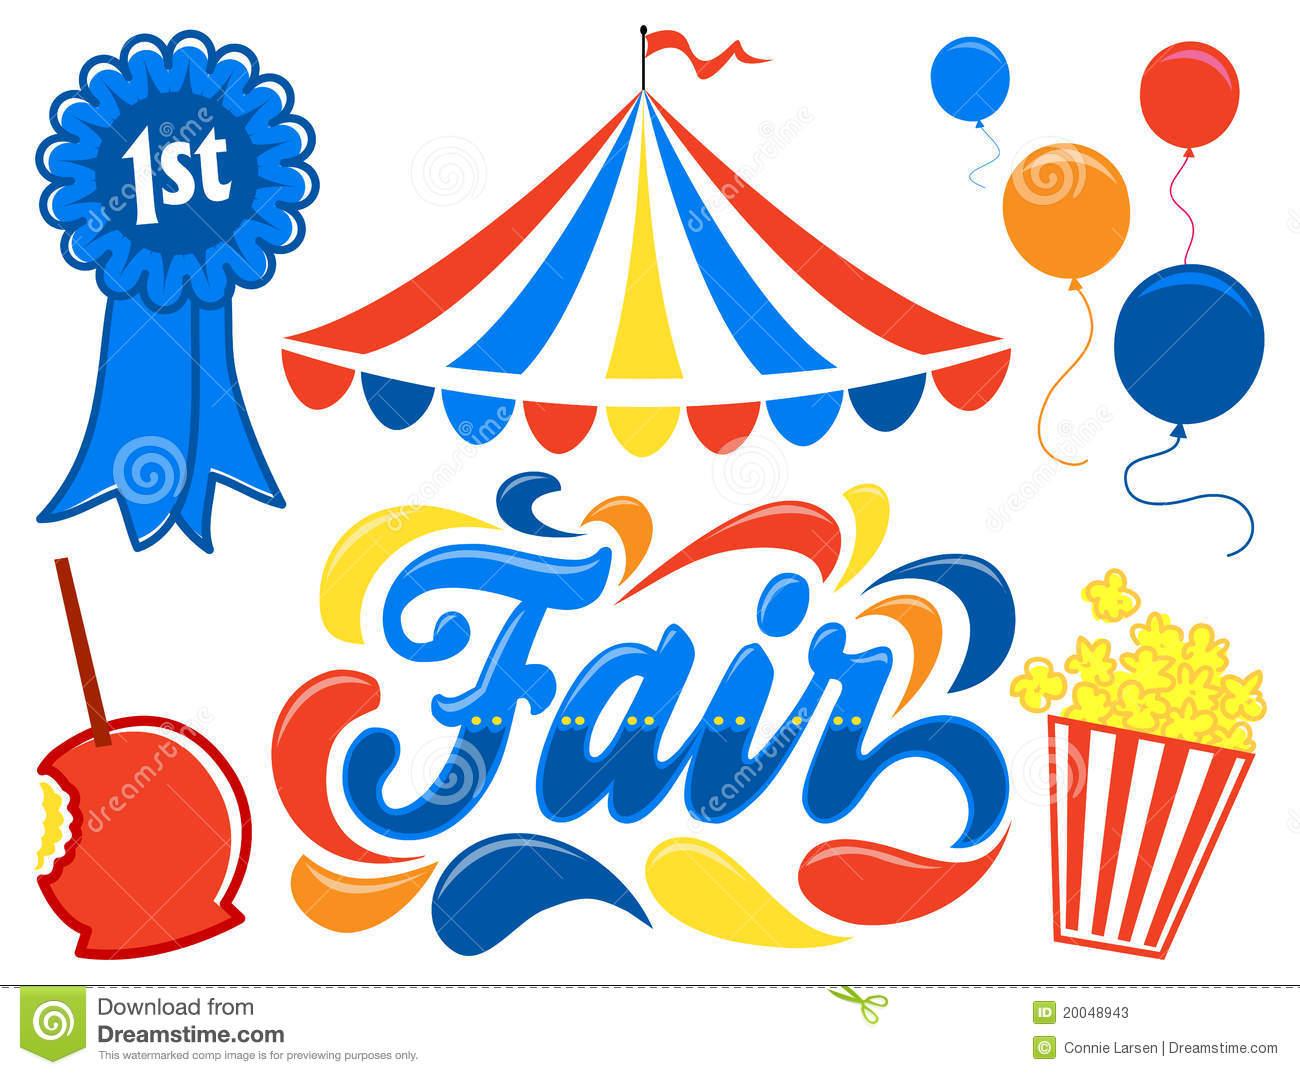 Clip Art Fairs and Festivals